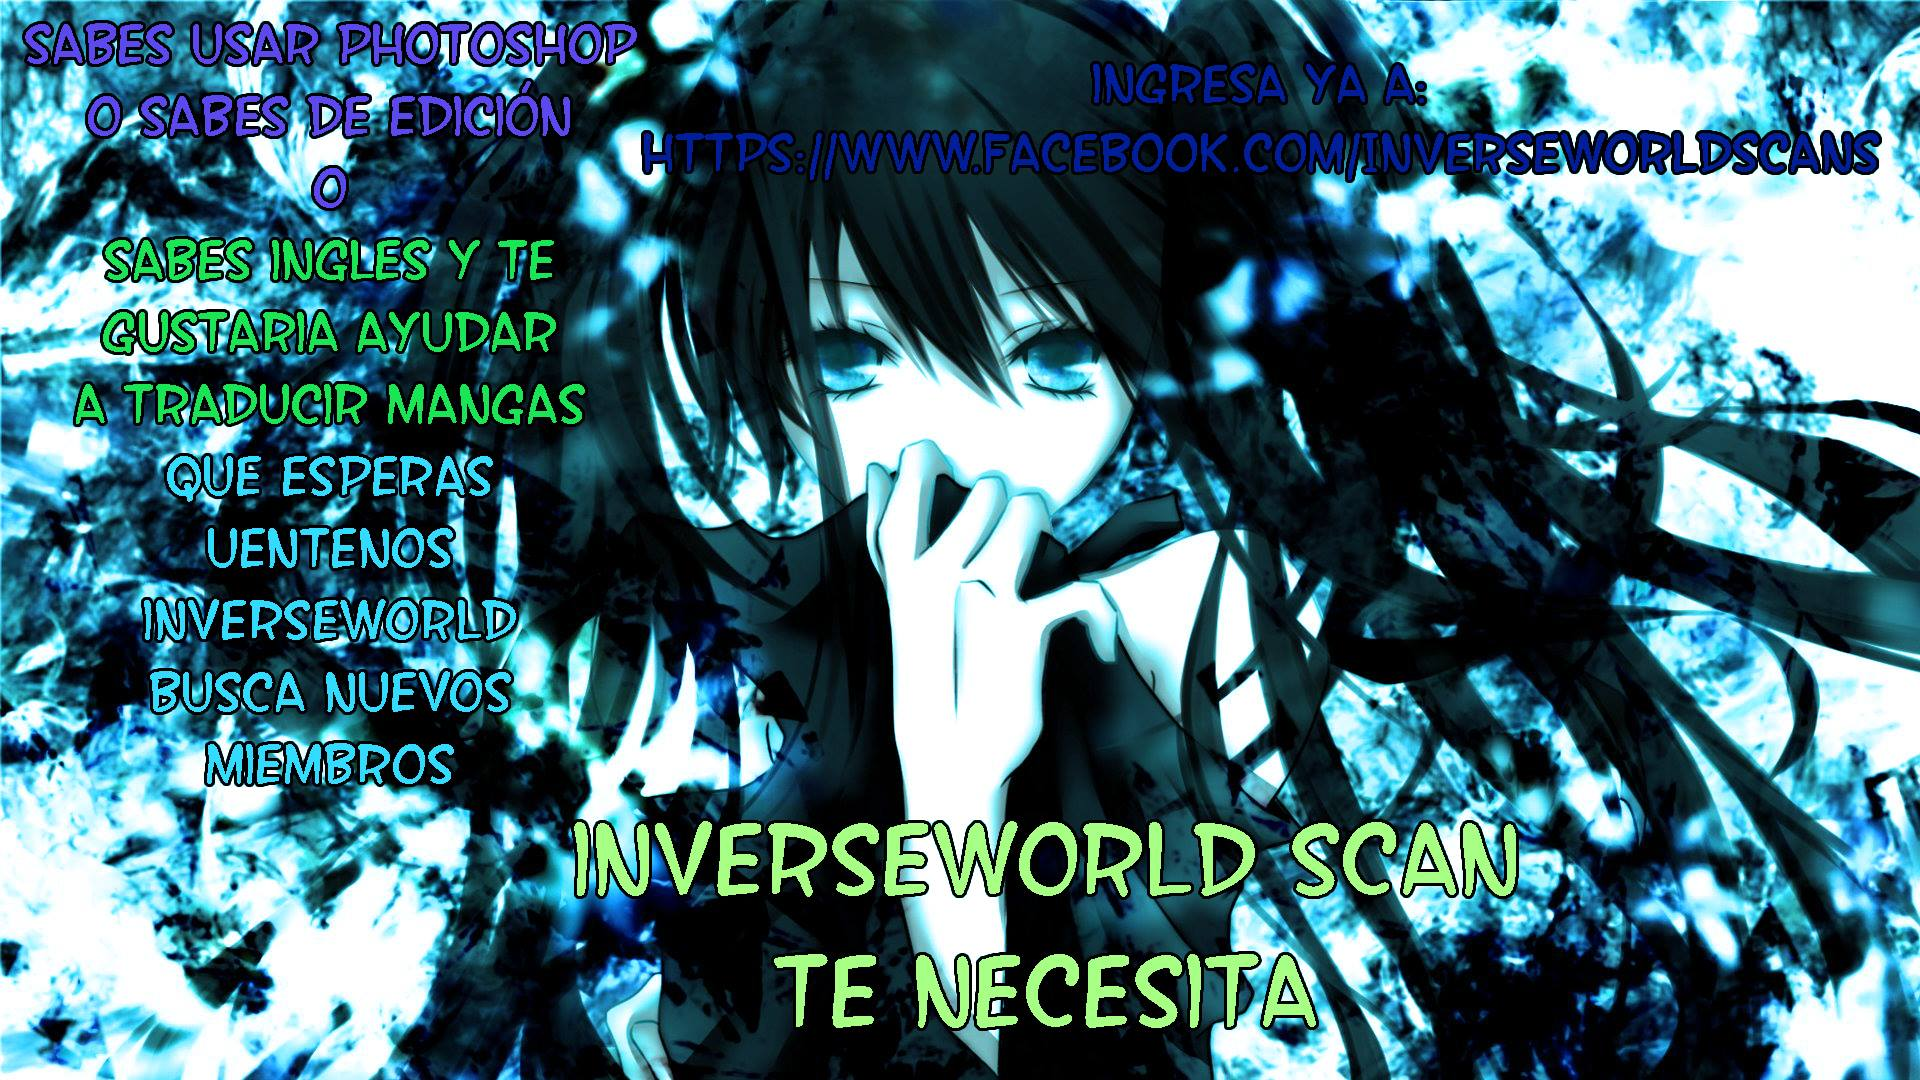 https://c5.mangatag.com/es_manga/18/16210/415300/0d92af1eab239465721da02549c61854.jpg Page 1